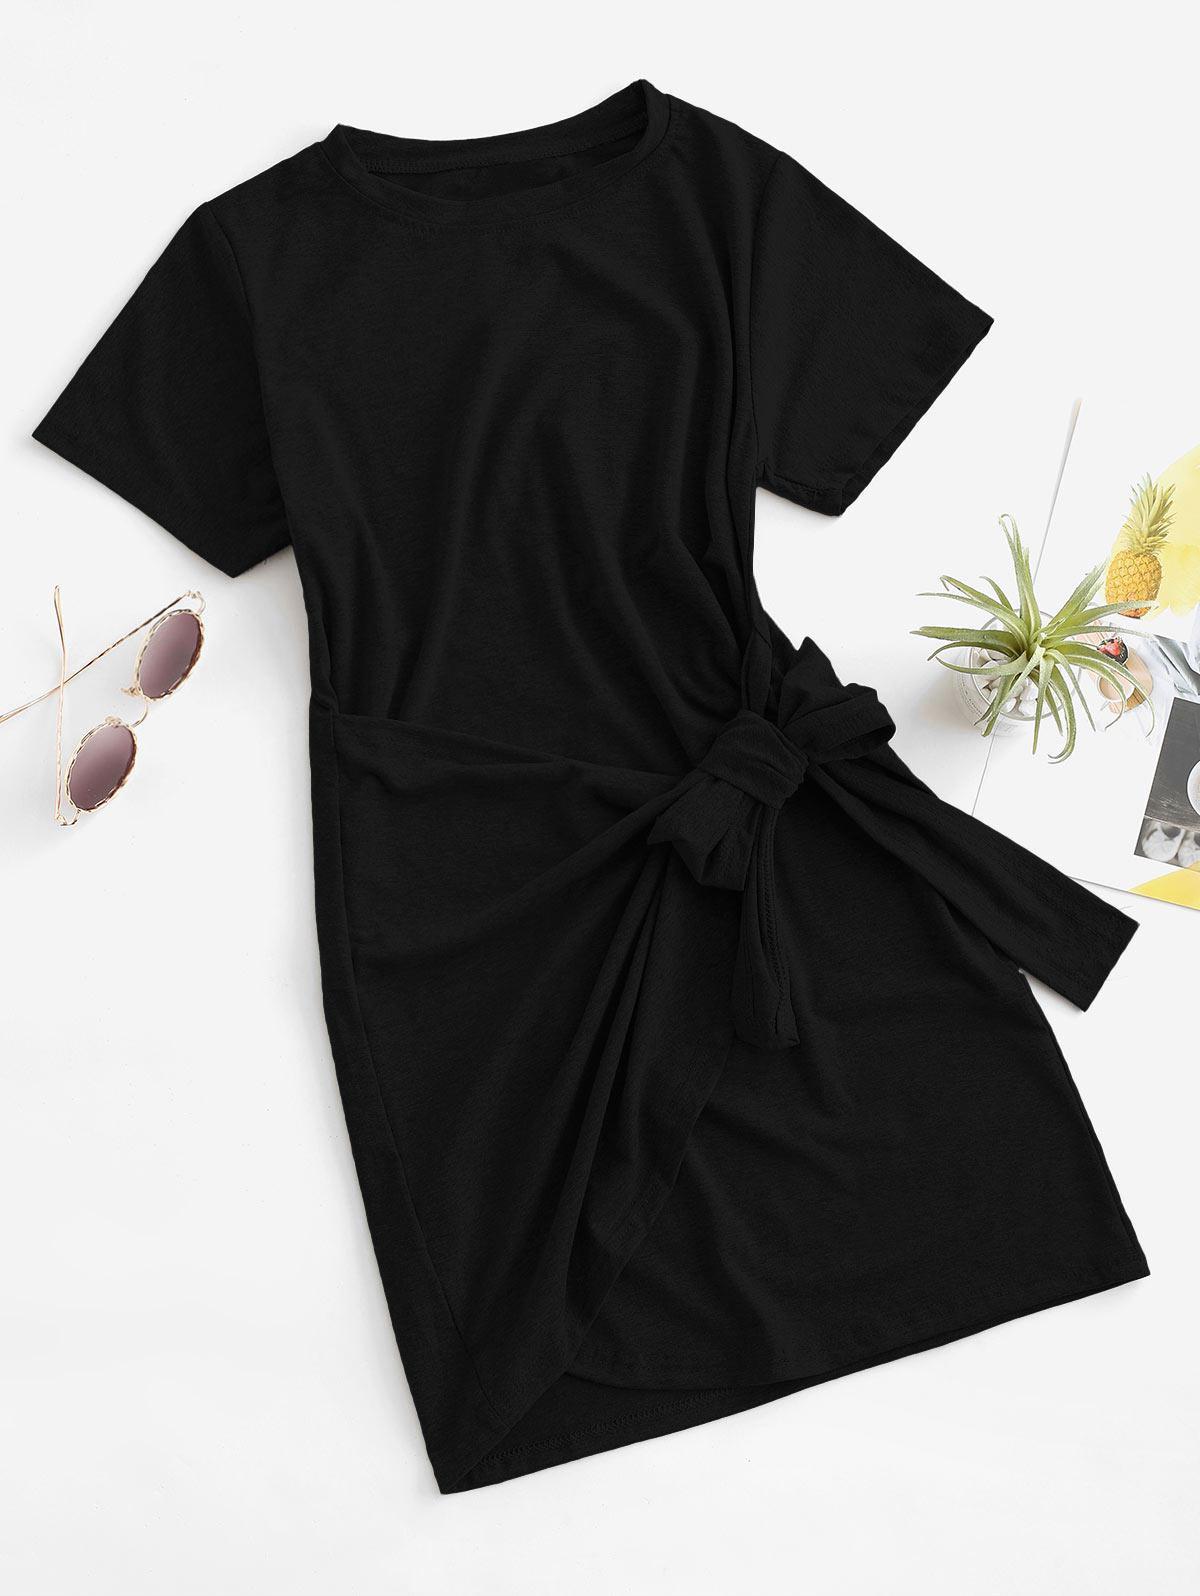 Overlap Tie Short Sleeve Tee Dress